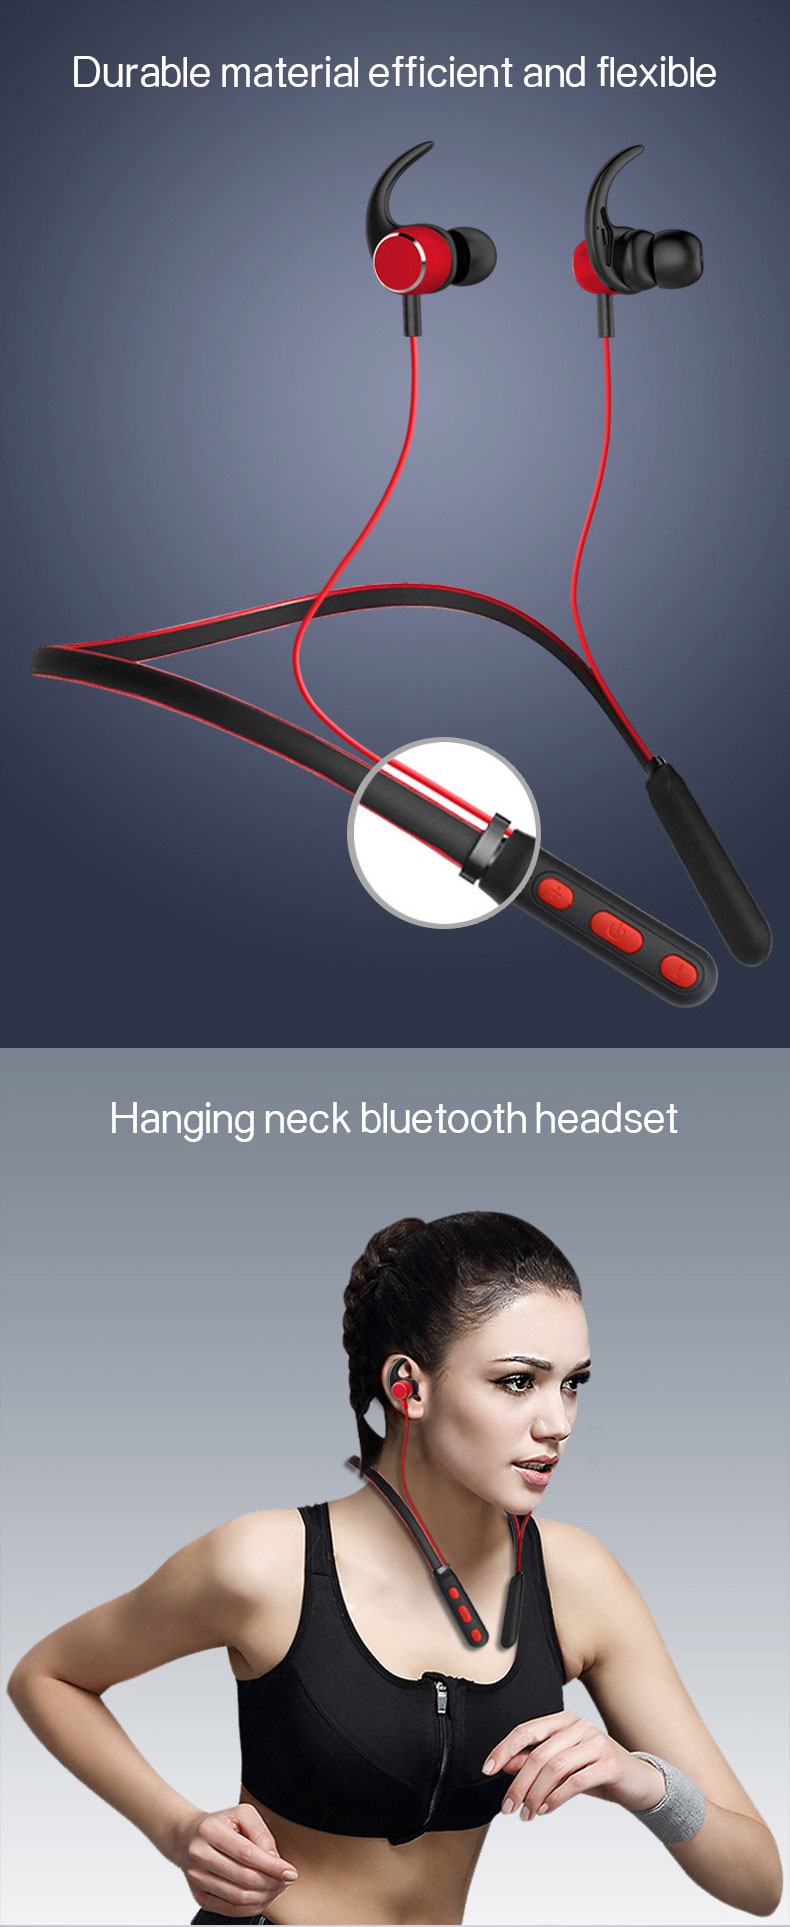 Caridite Popular Neck Bluetooth Earphone Ture Stereo Wireless Fitness Headset Tiktok Gril Gift Sport Neckband Headphone Earphone